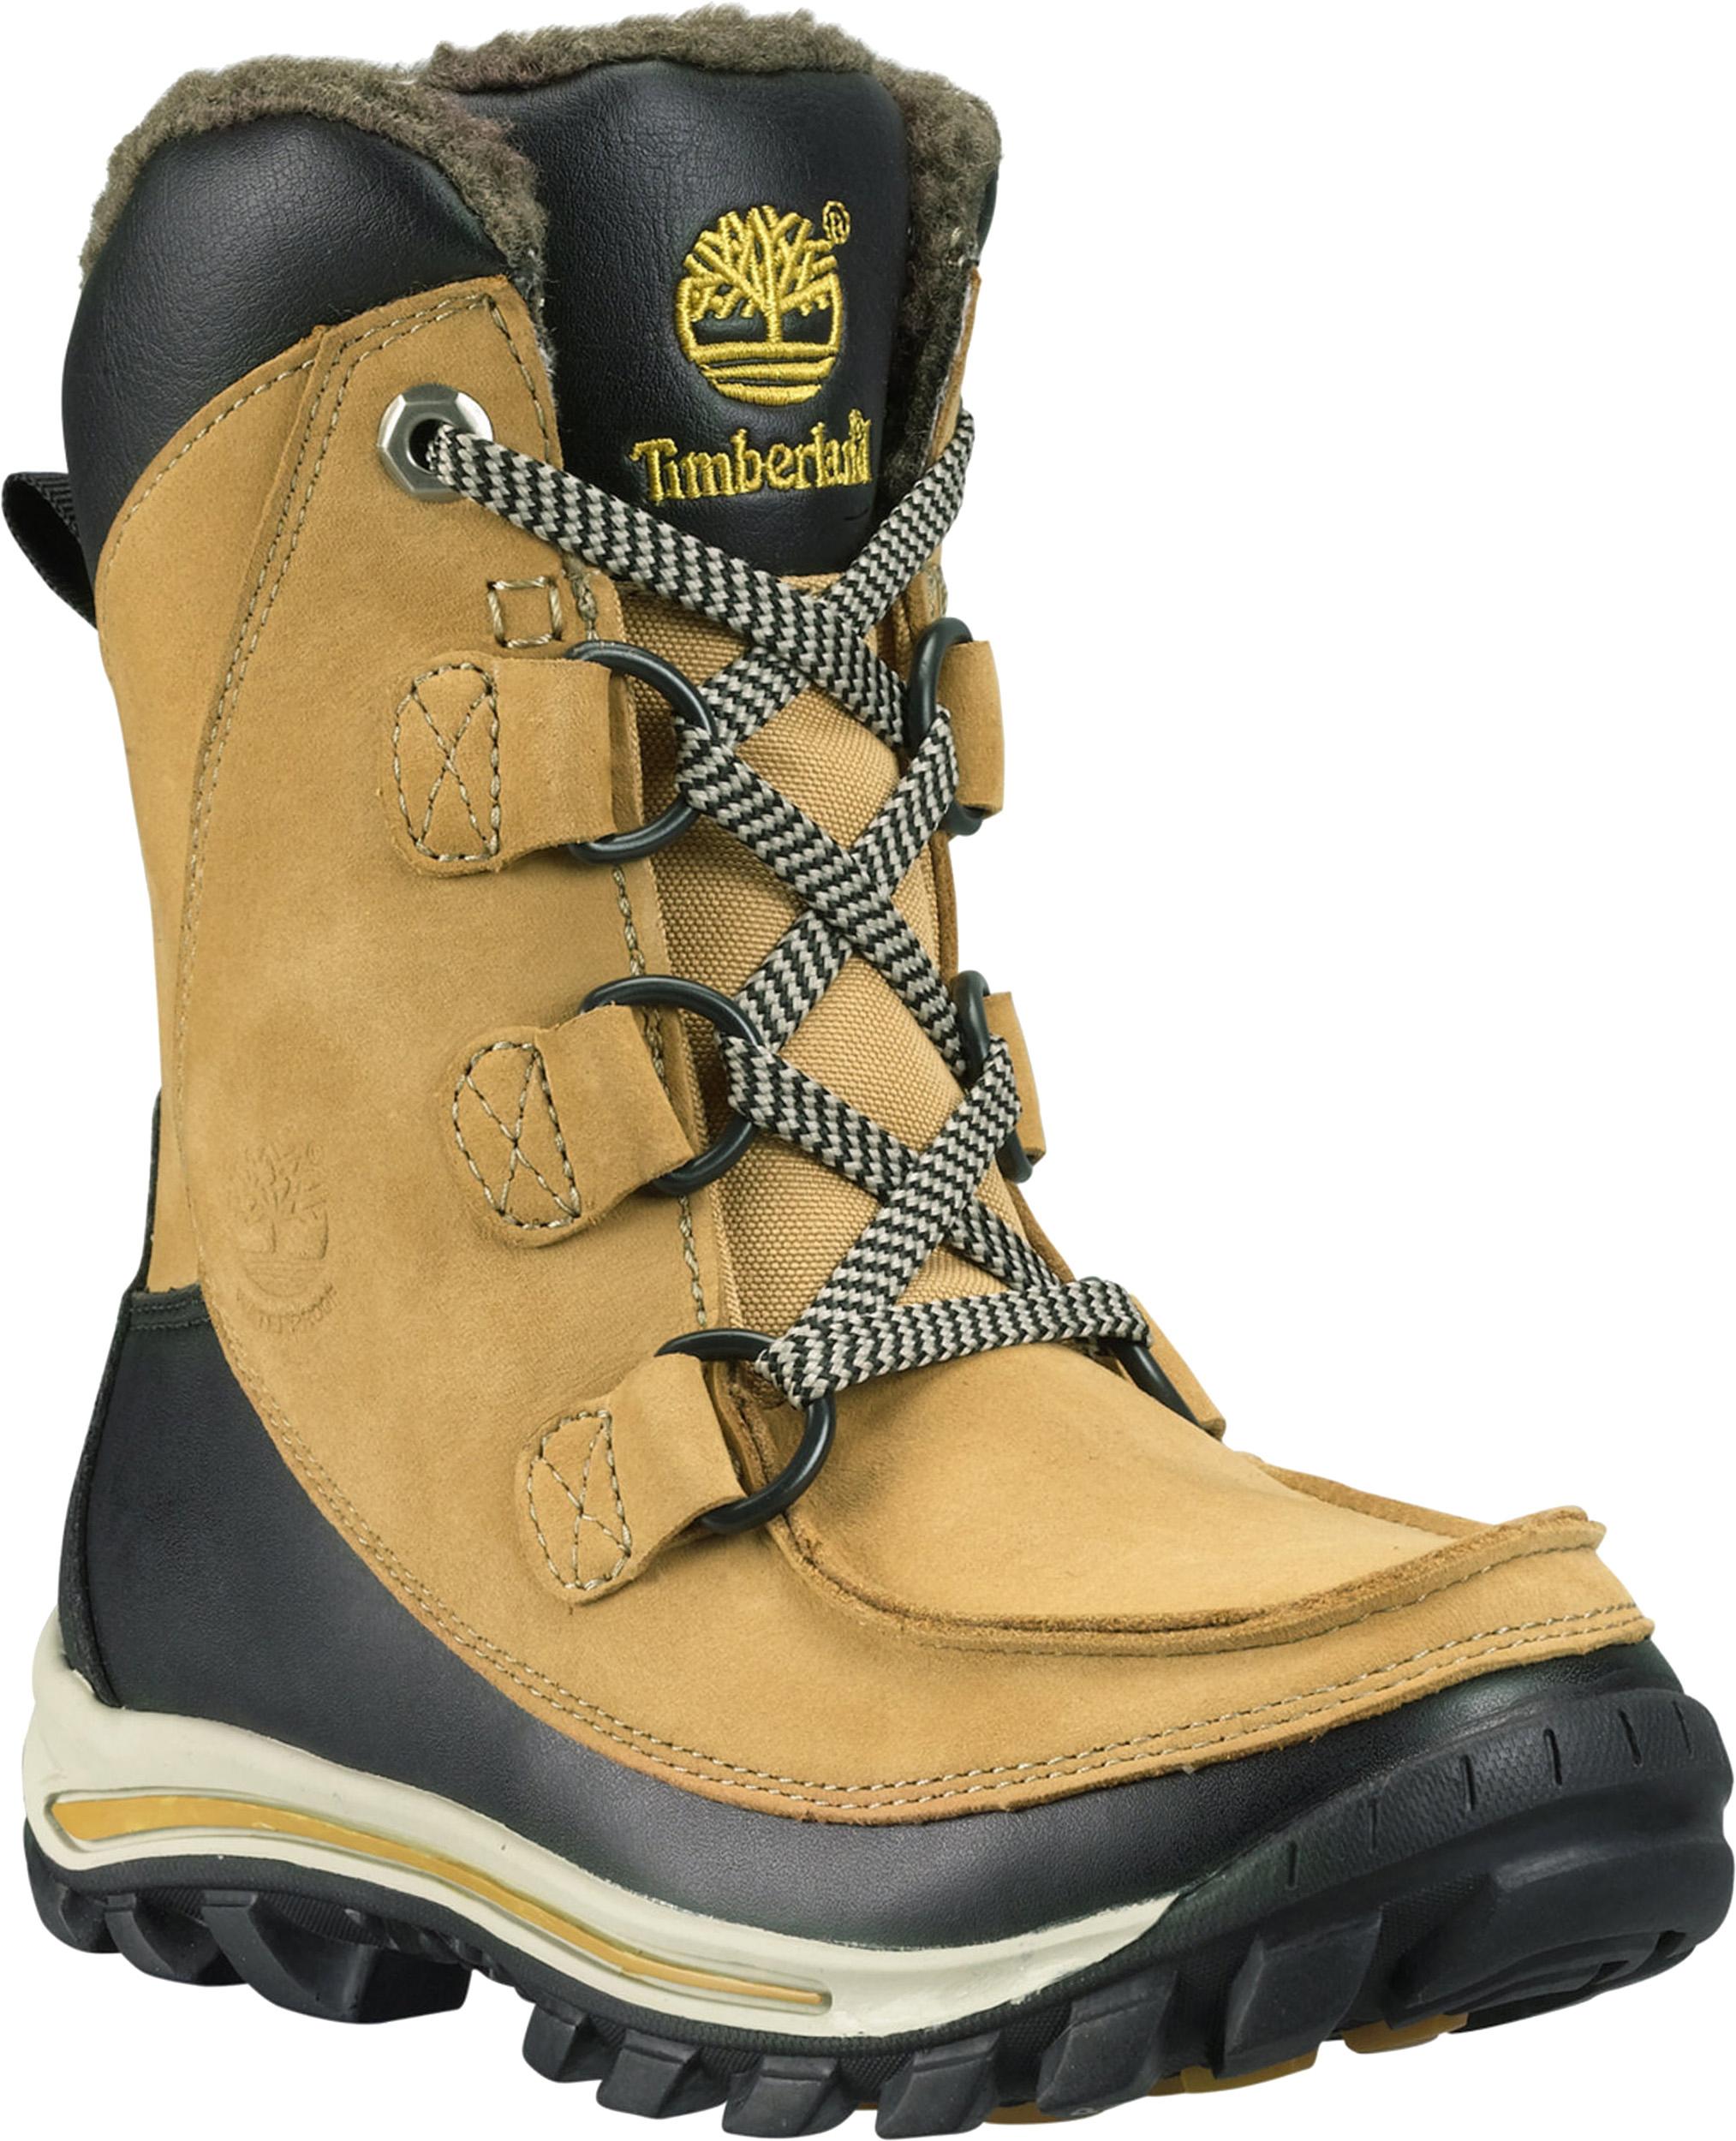 Timberland Rime Ridge HP Waterproof Winter Boots - Children to ... ee1d1481b